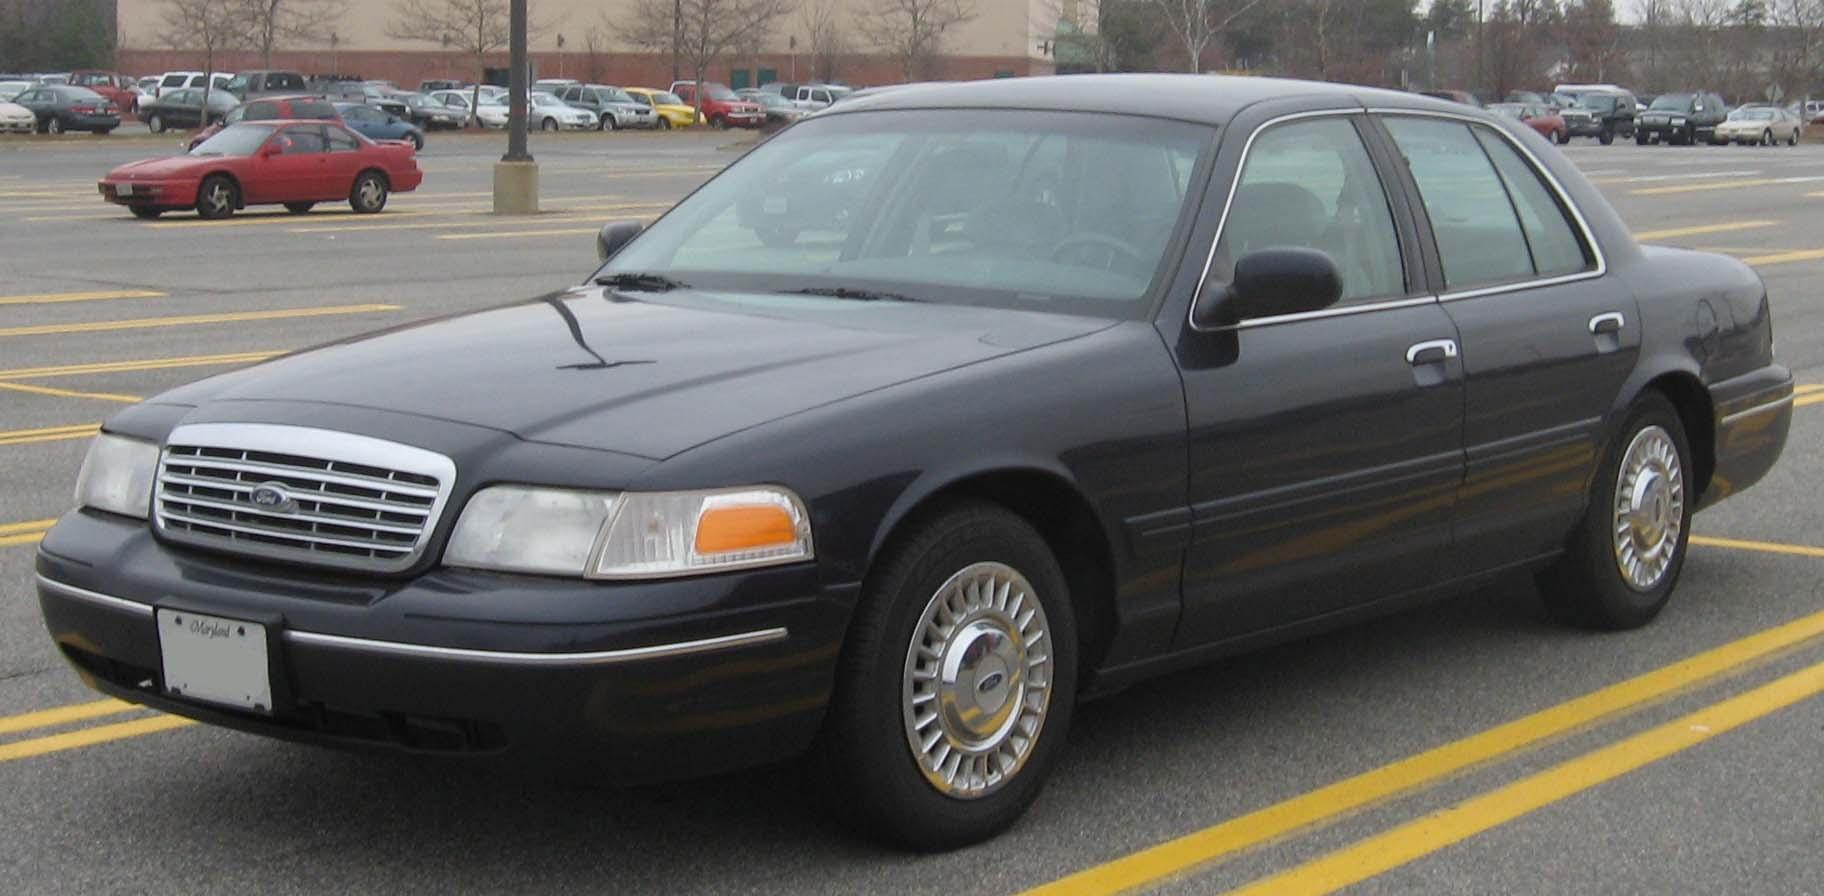 Ford Crown Victoria 2002 года выпуска